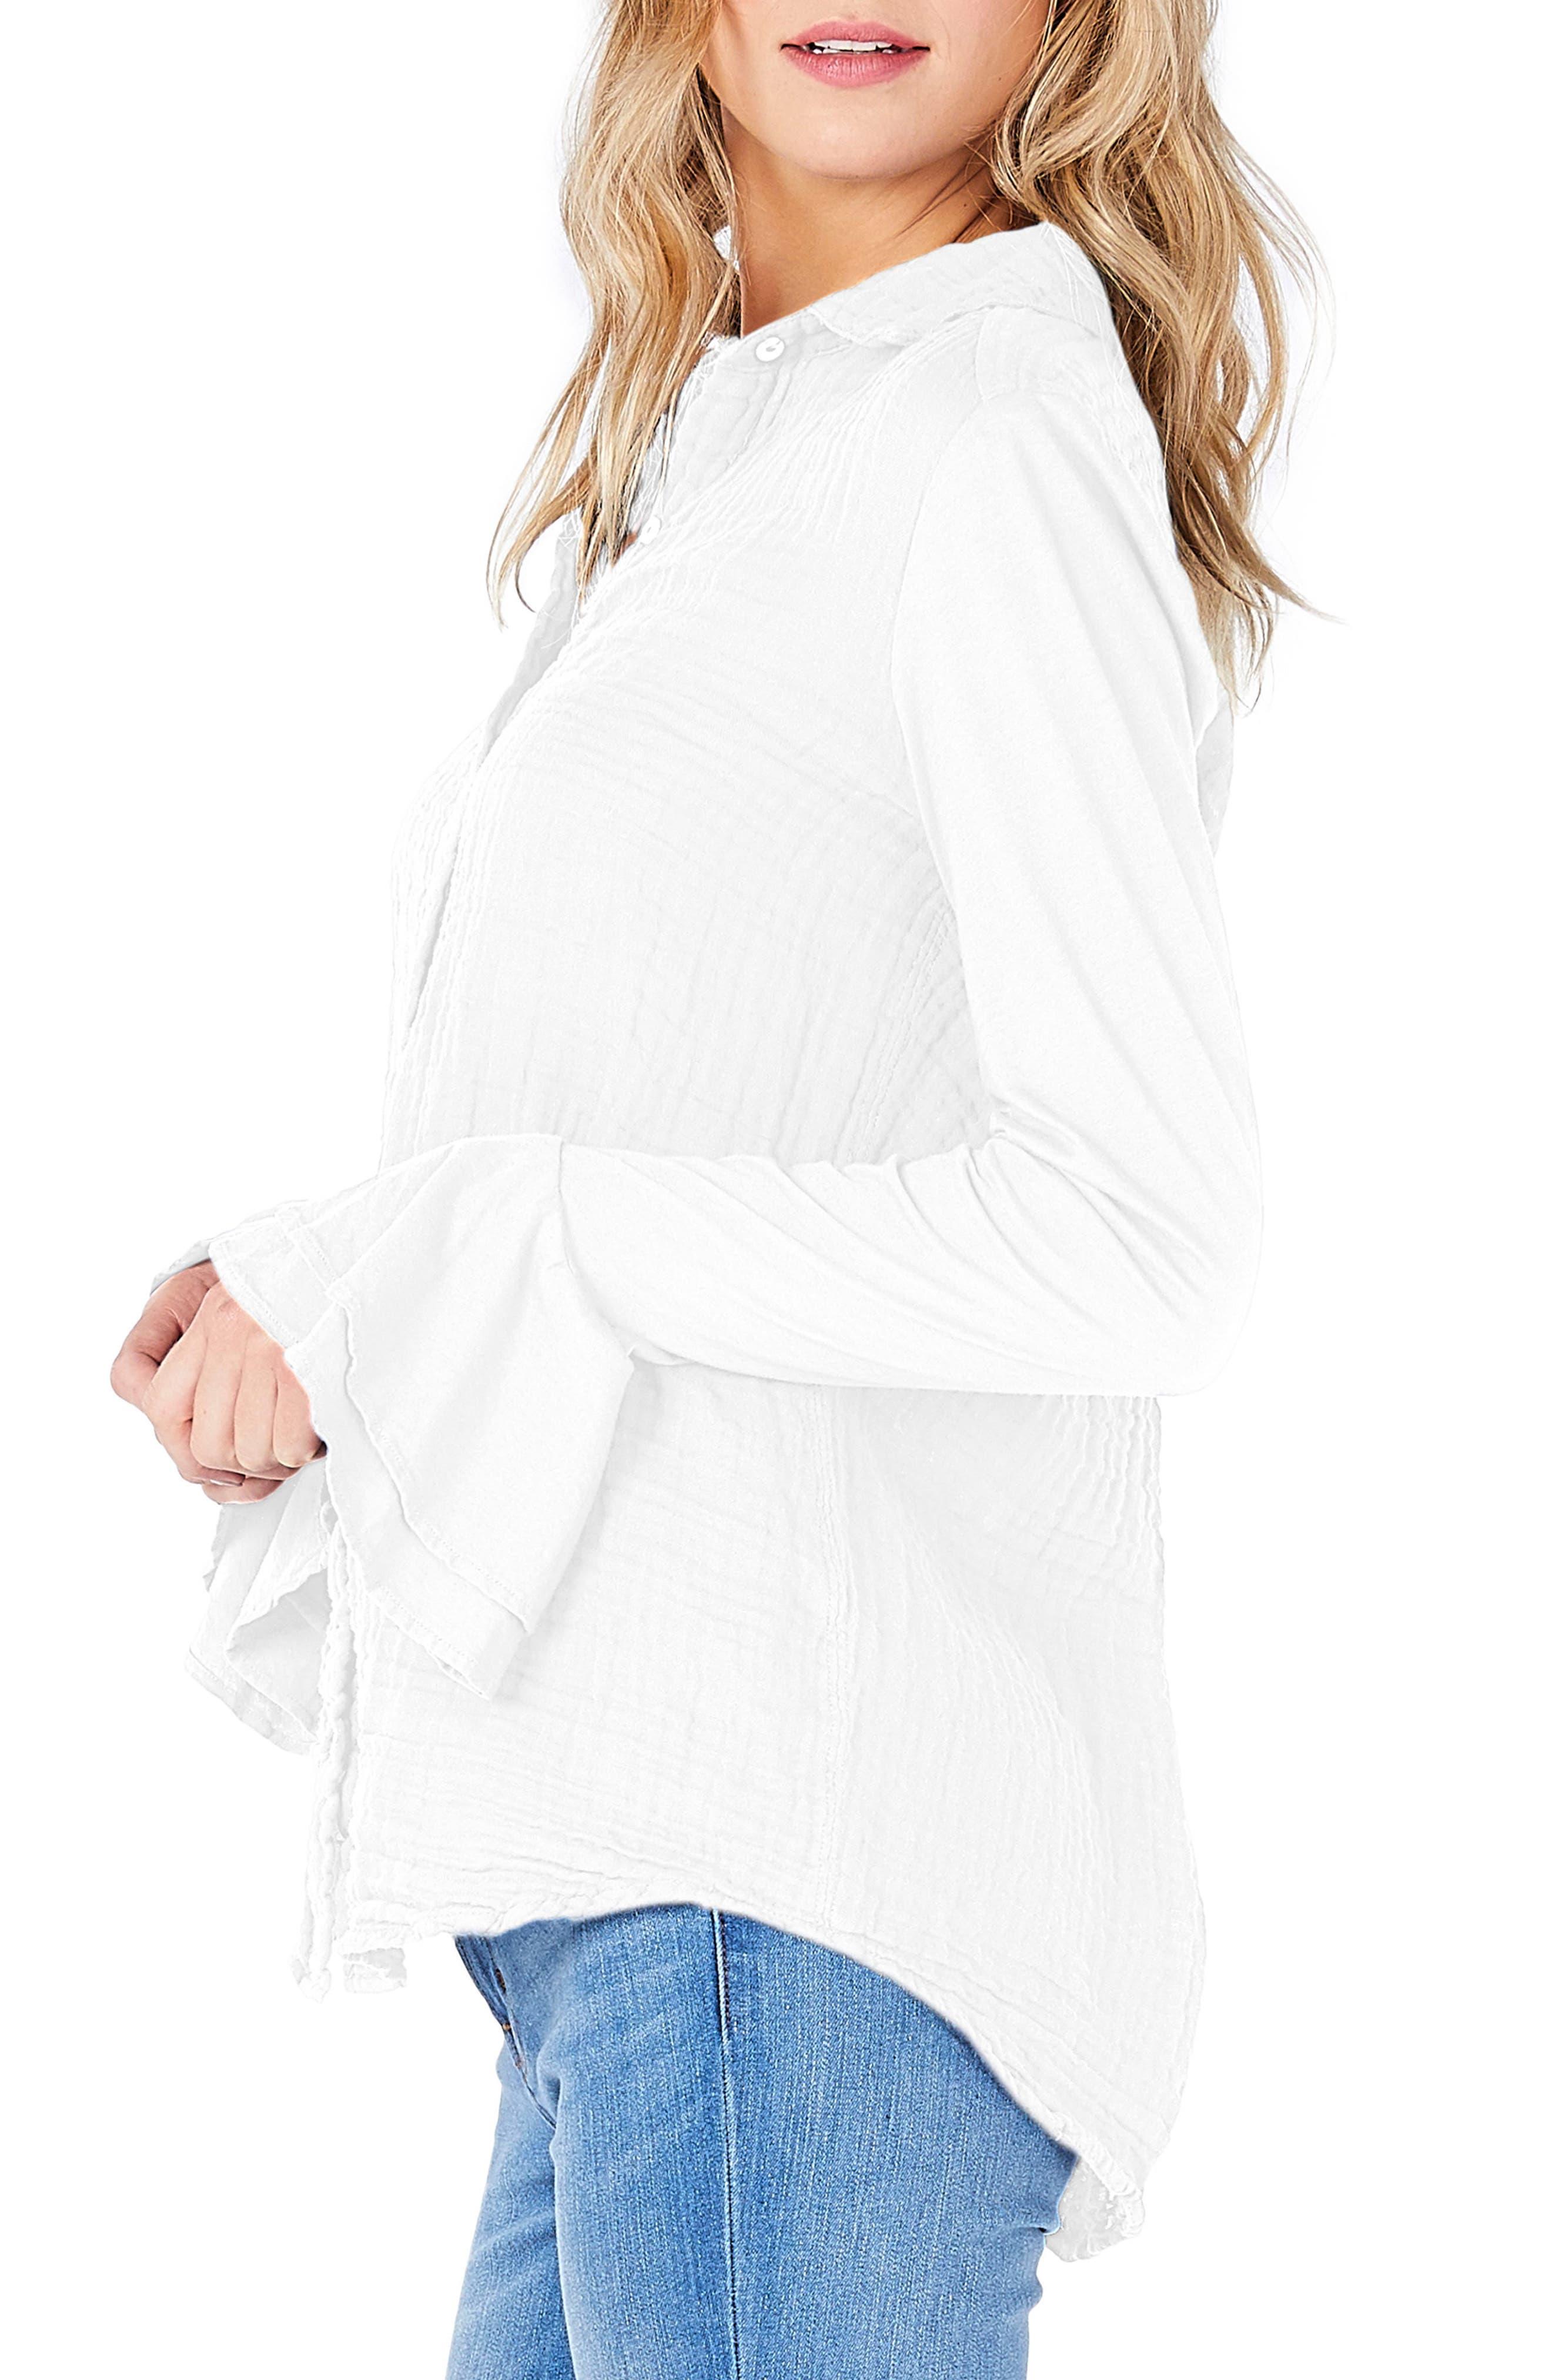 Ruffle Sleeve Shirt,                             Alternate thumbnail 3, color,                             White